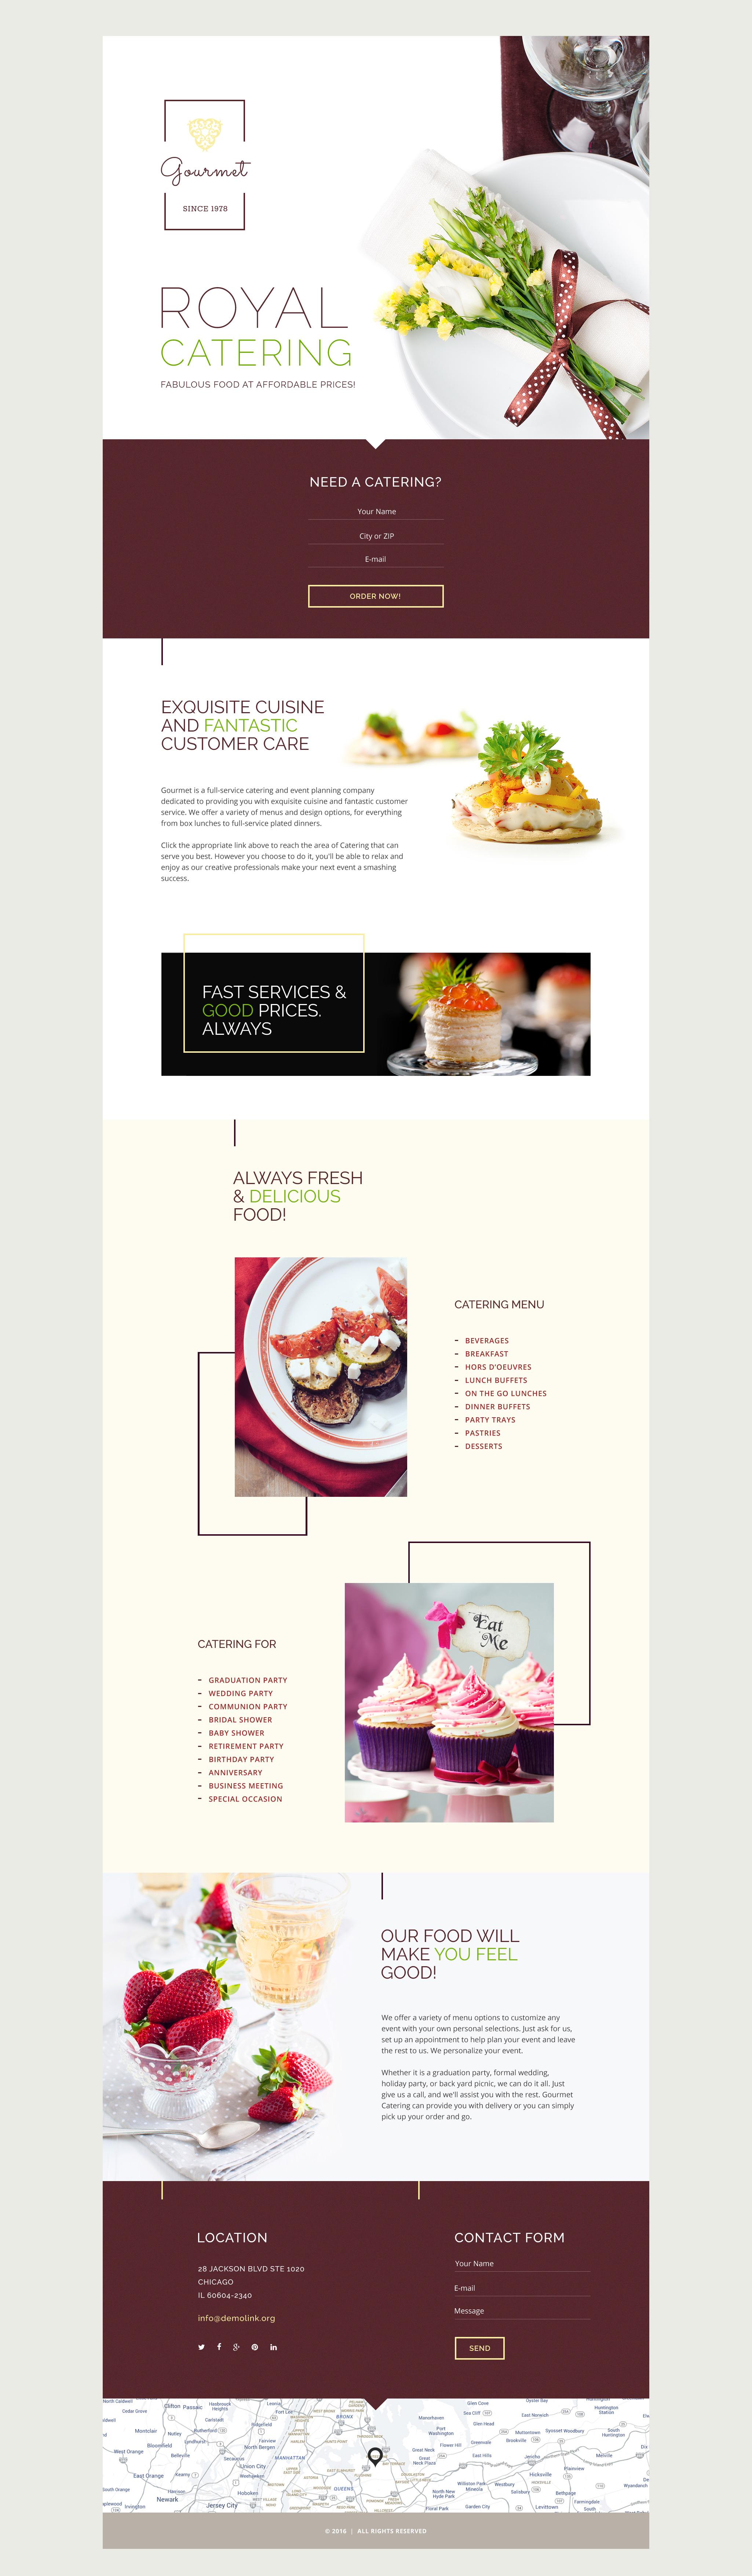 Responsywny szablon Landing Page Gourmet #58458 - zrzut ekranu